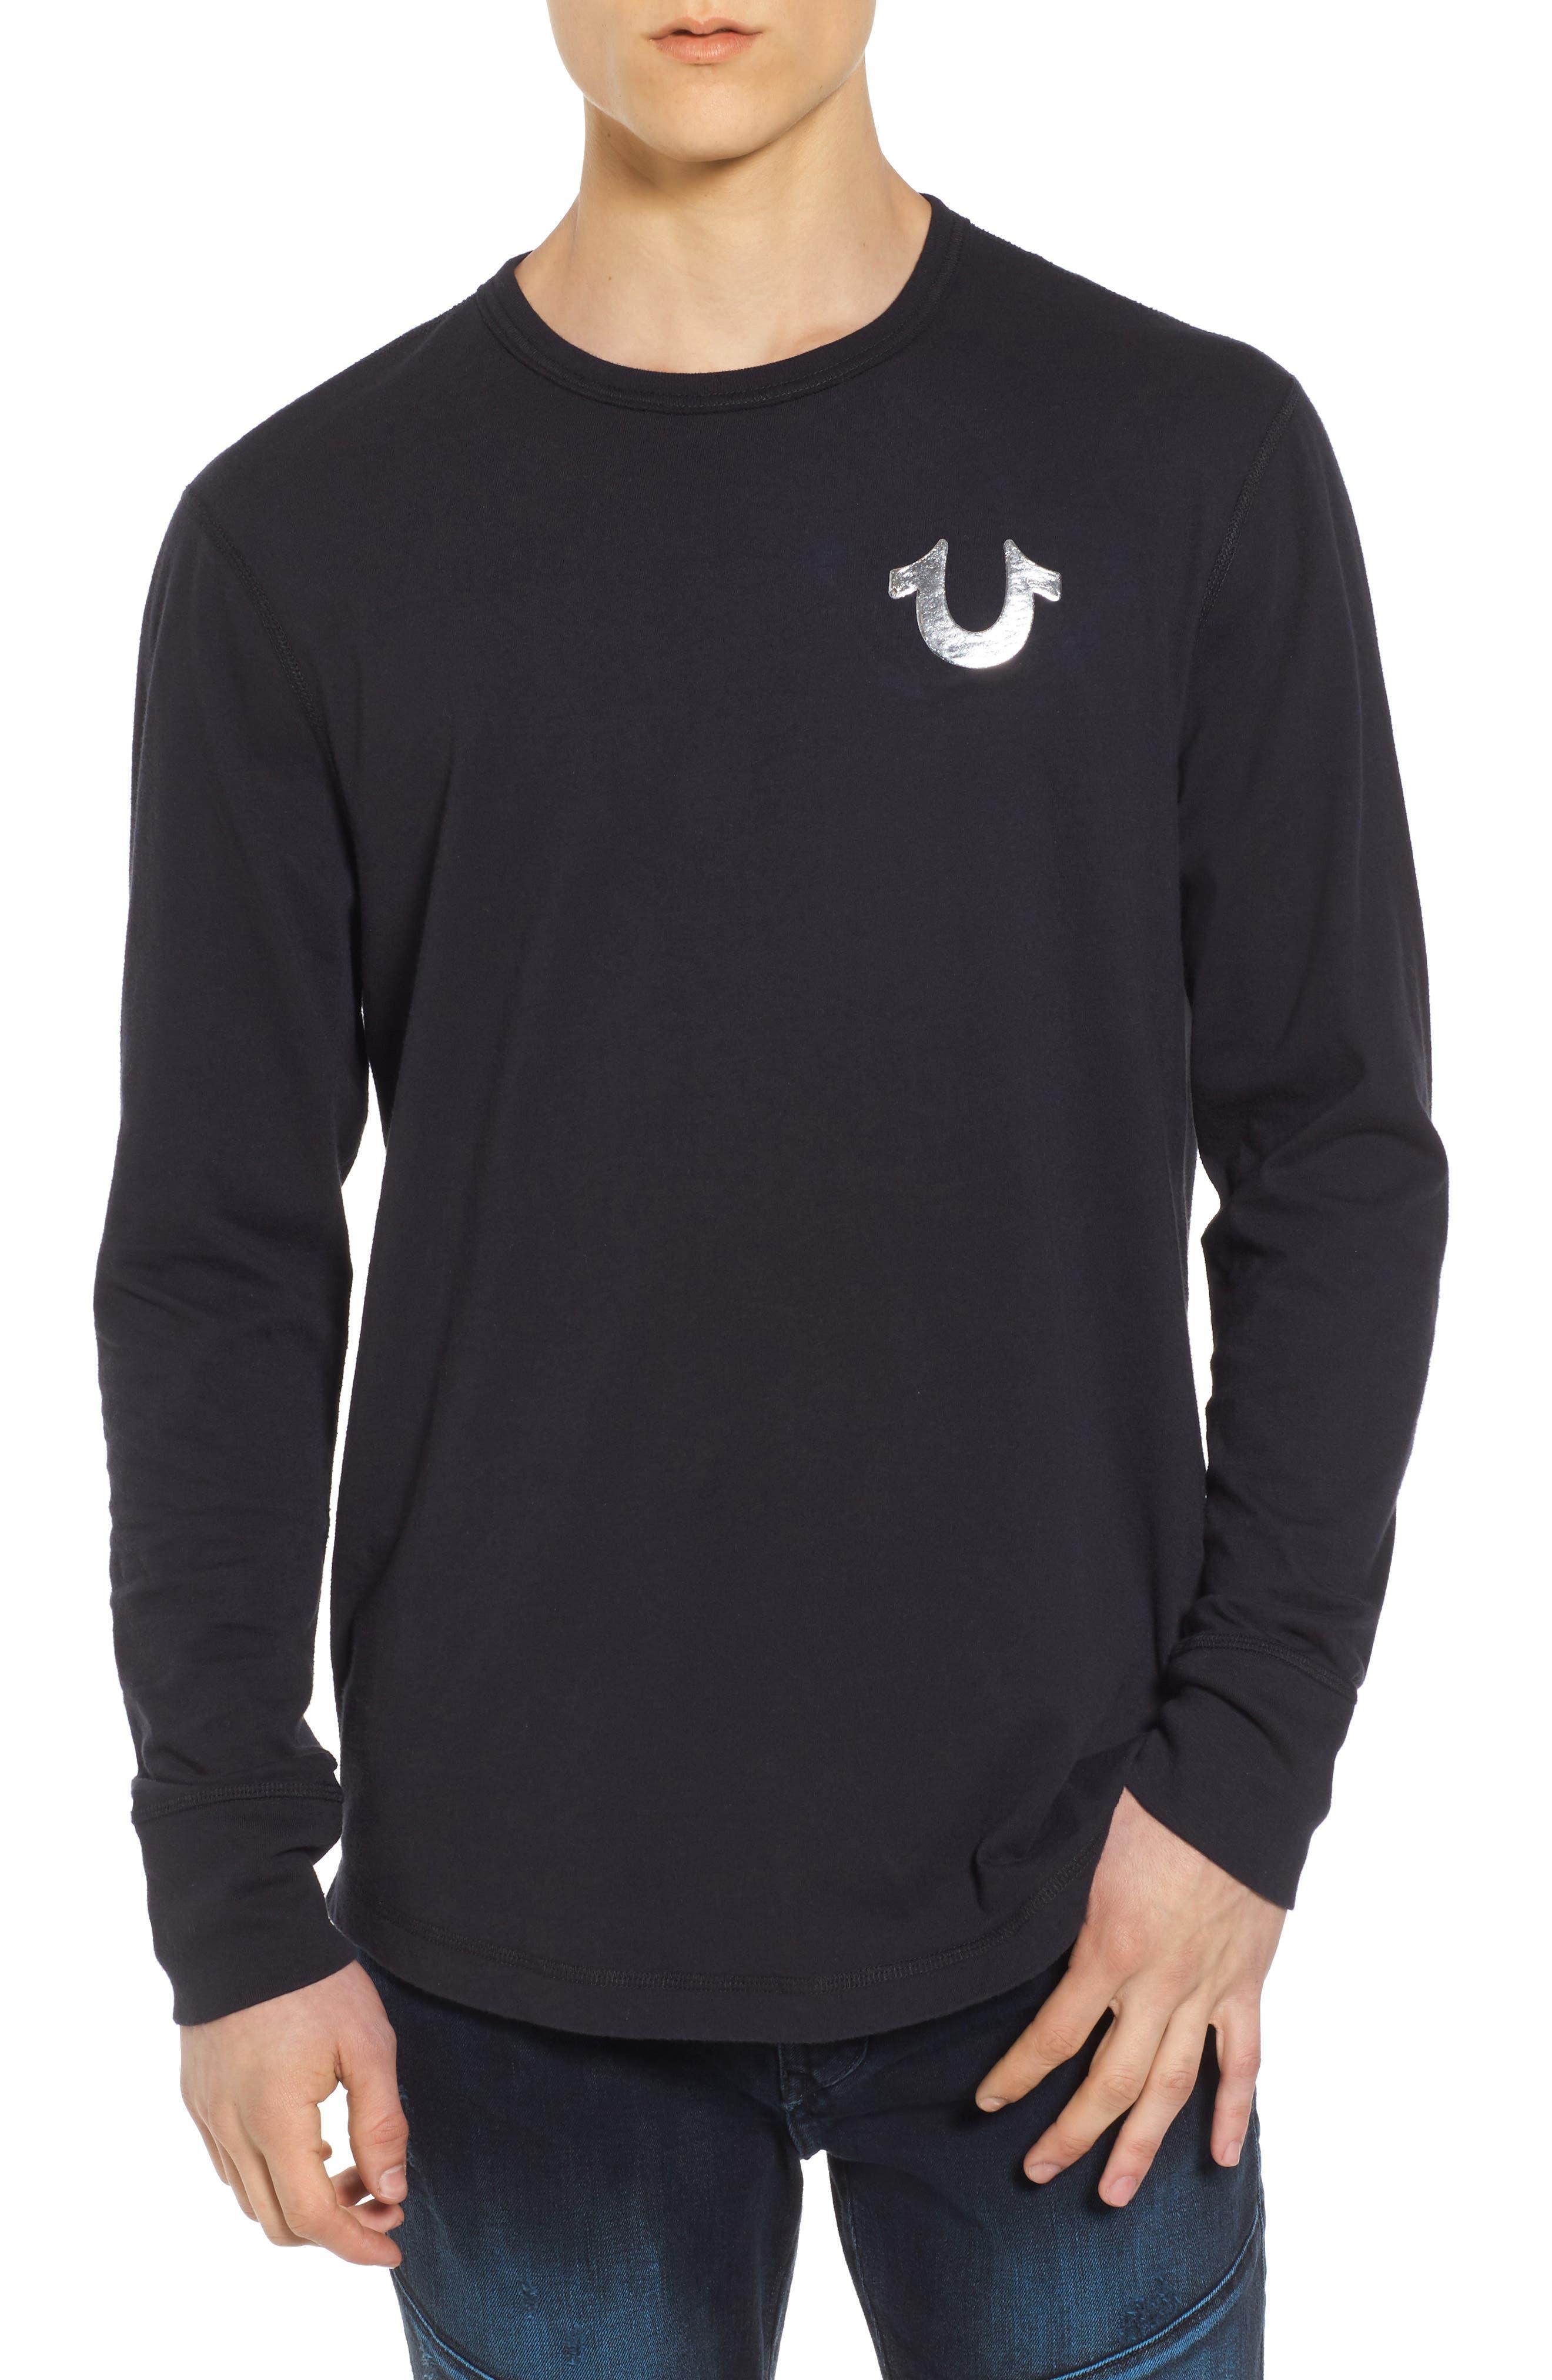 True Religion Core Metallic T-Shirt,                             Main thumbnail 1, color,                             001